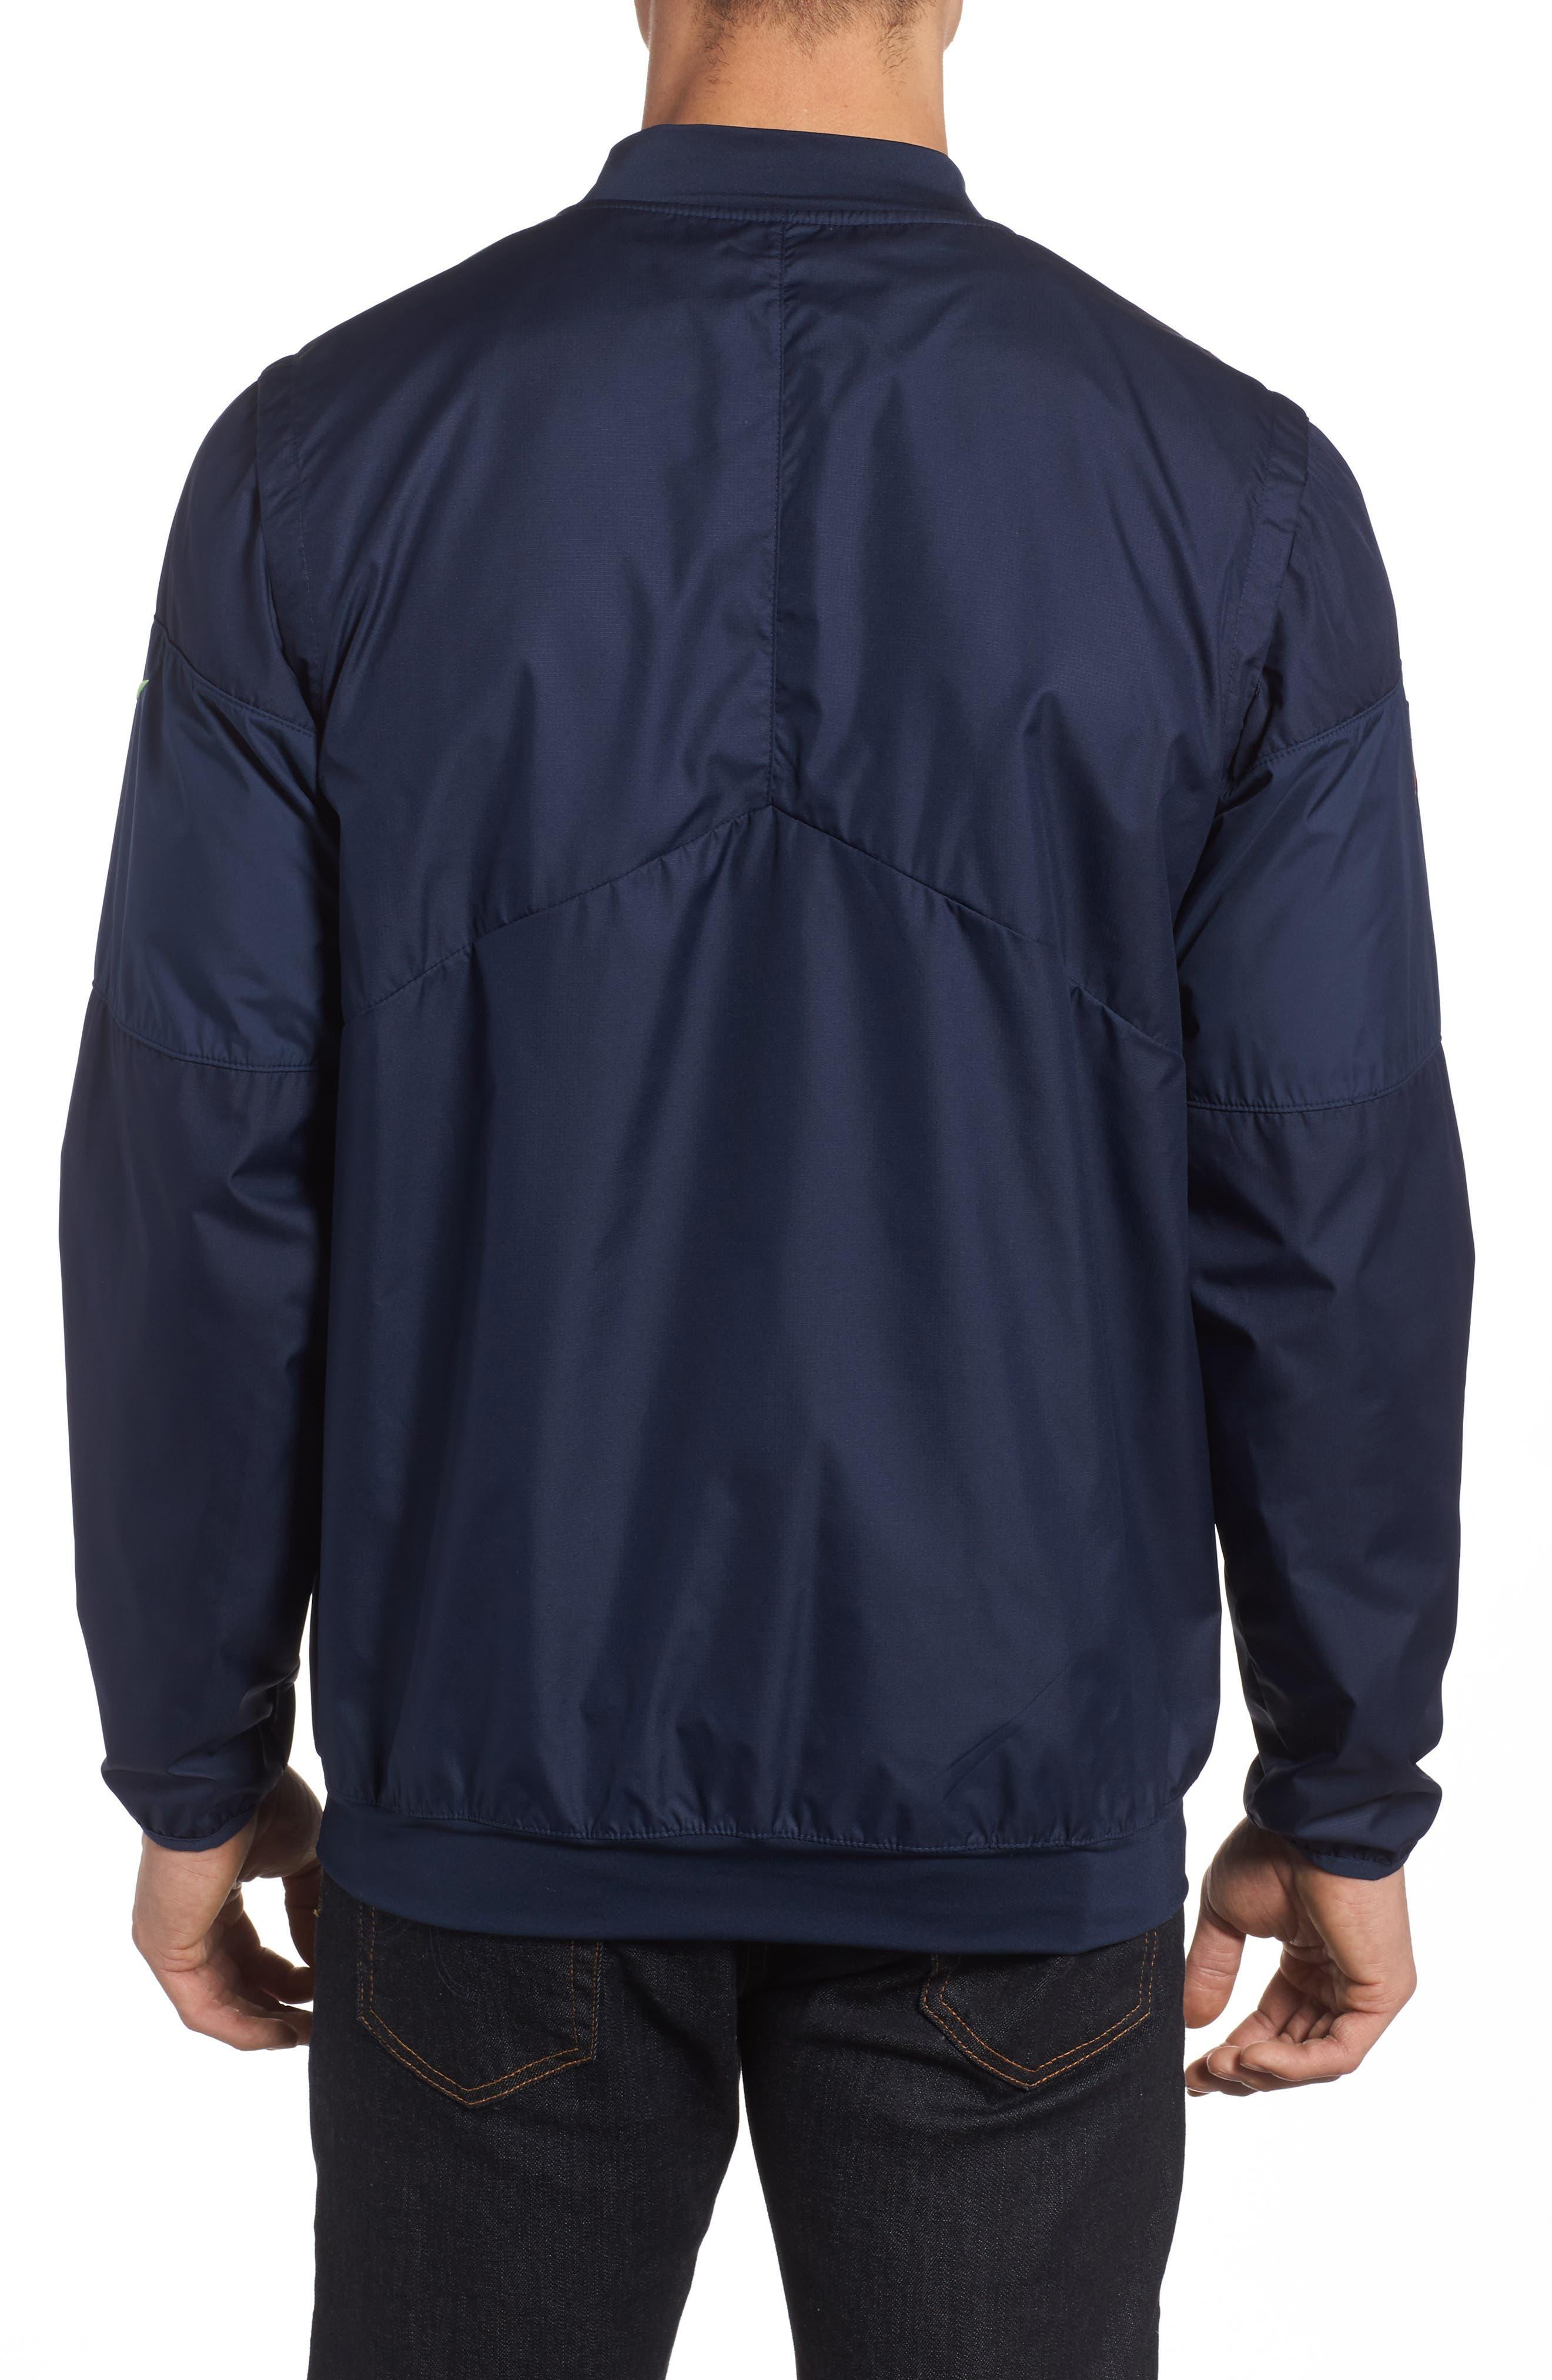 Lockdown NFL Pullover Jacket,                             Alternate thumbnail 9, color,